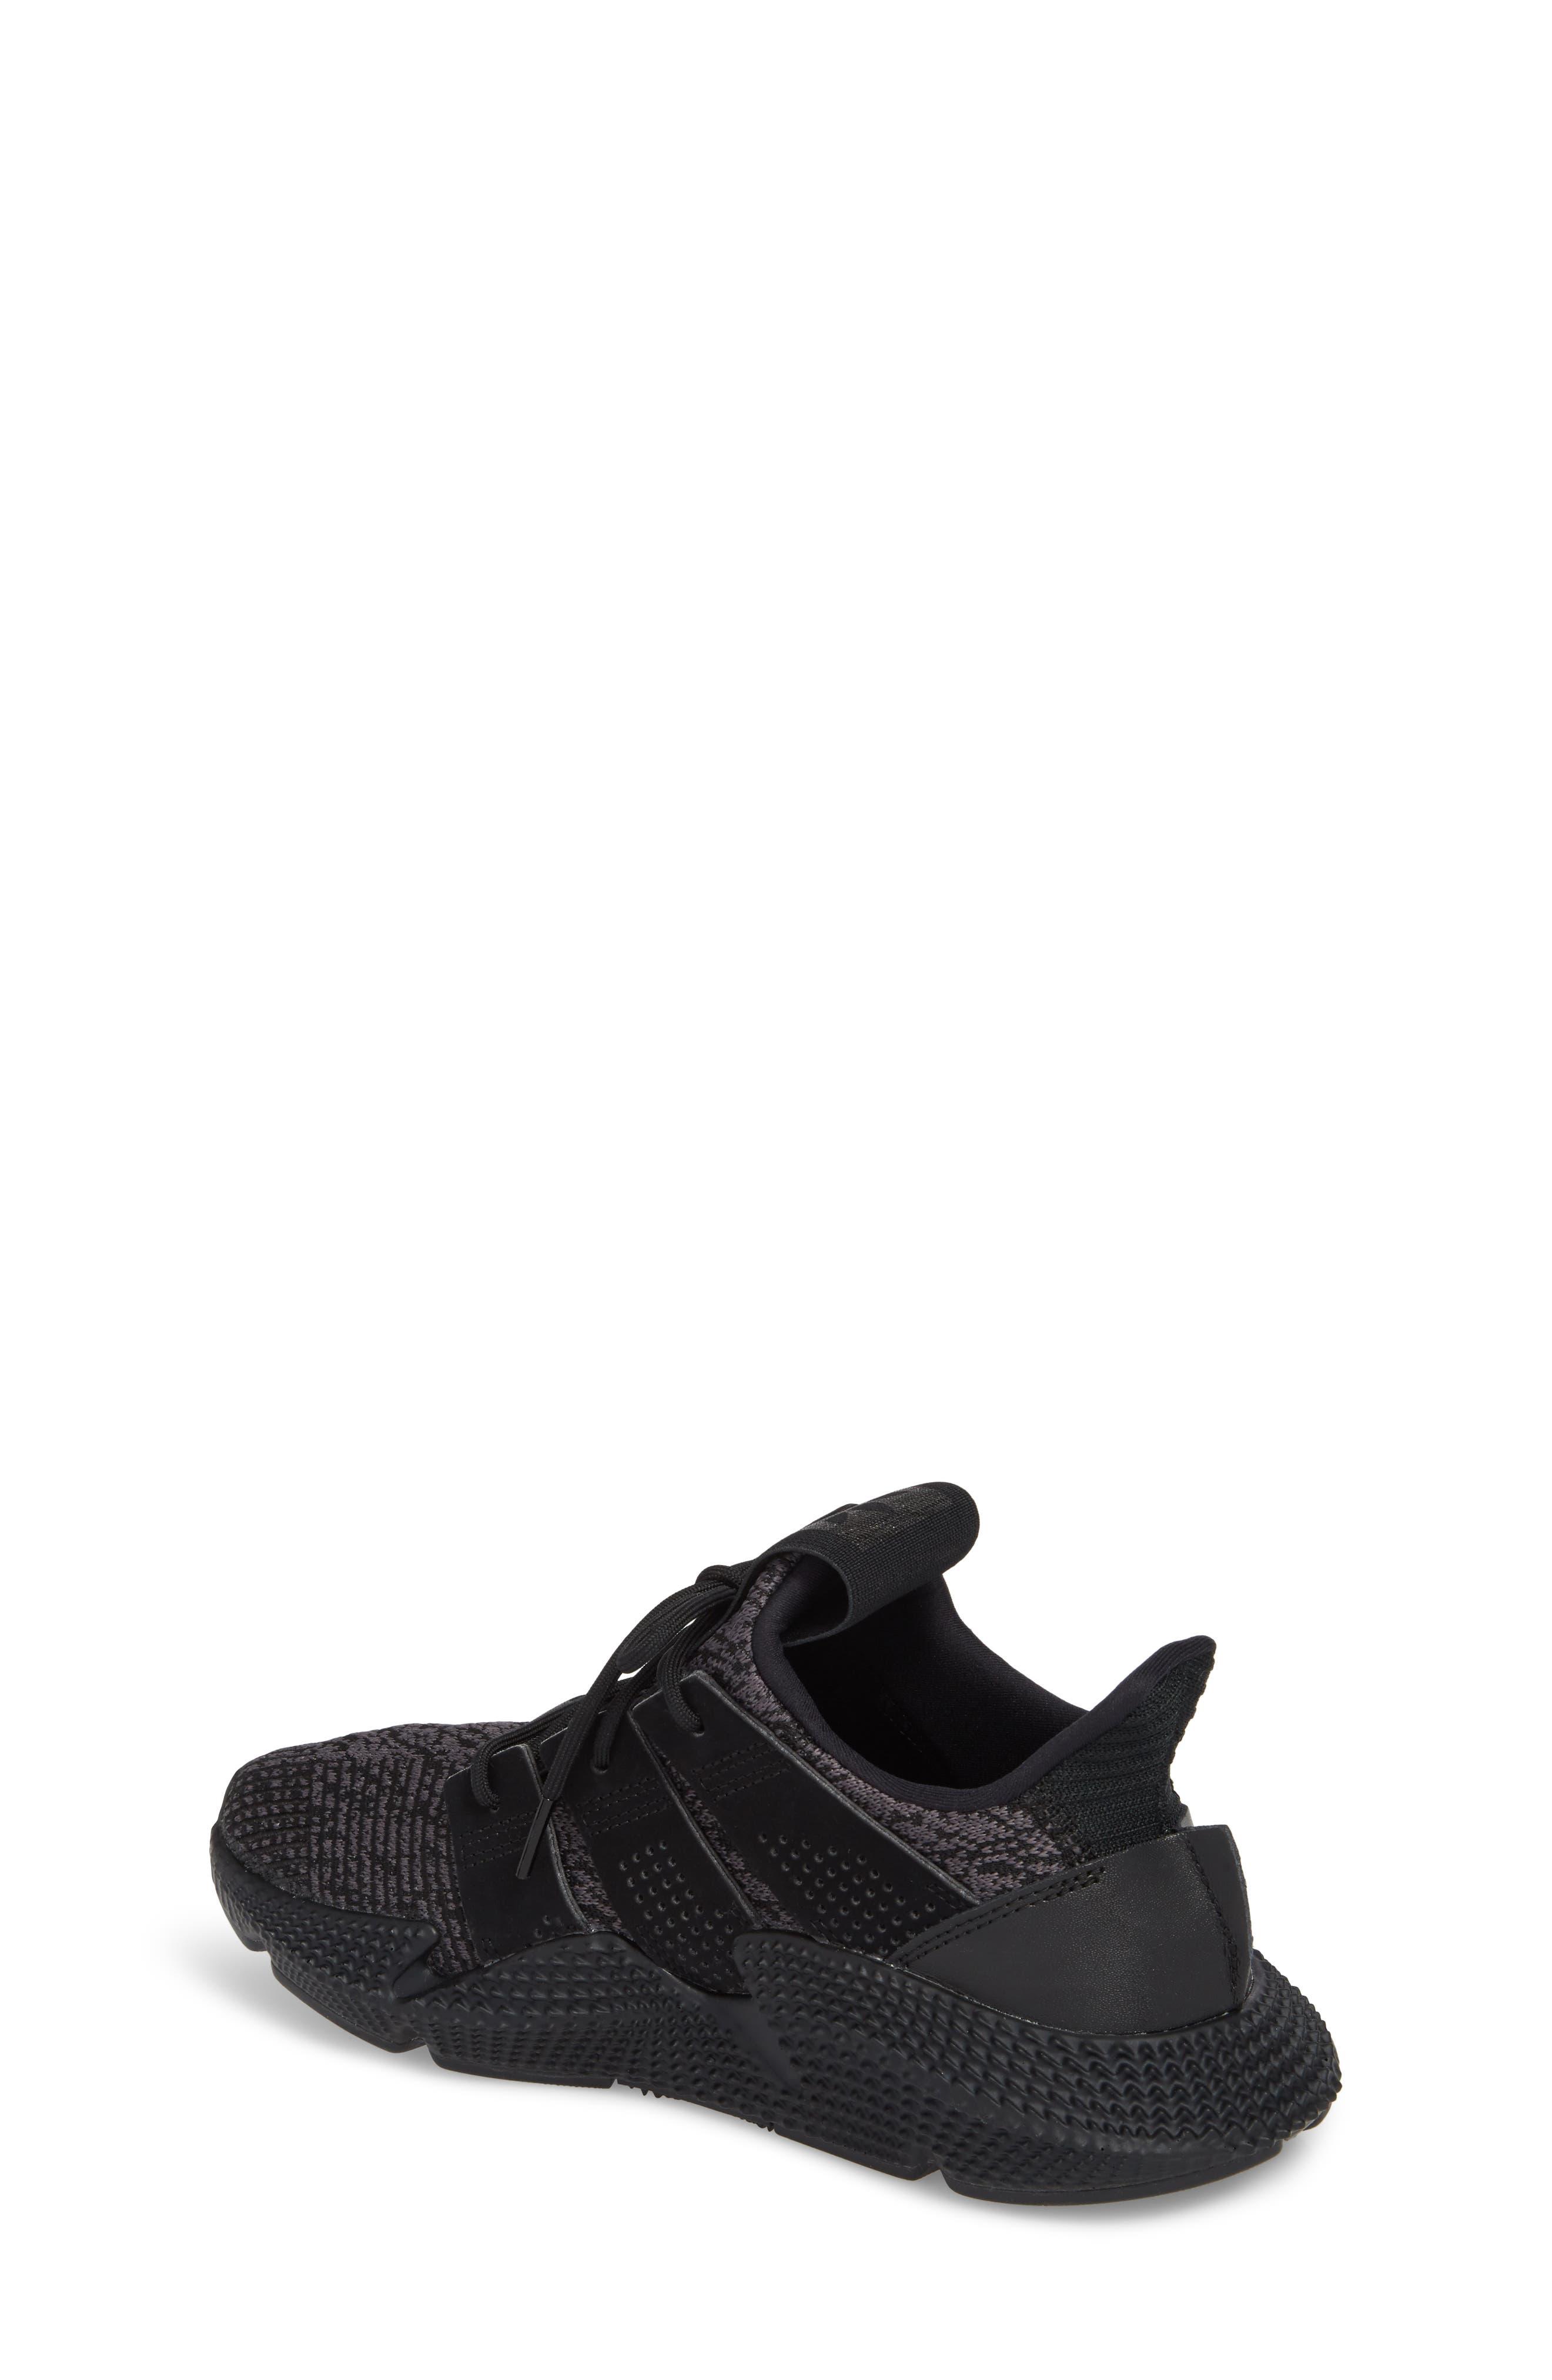 Prophere Sneaker,                             Alternate thumbnail 2, color,                             001